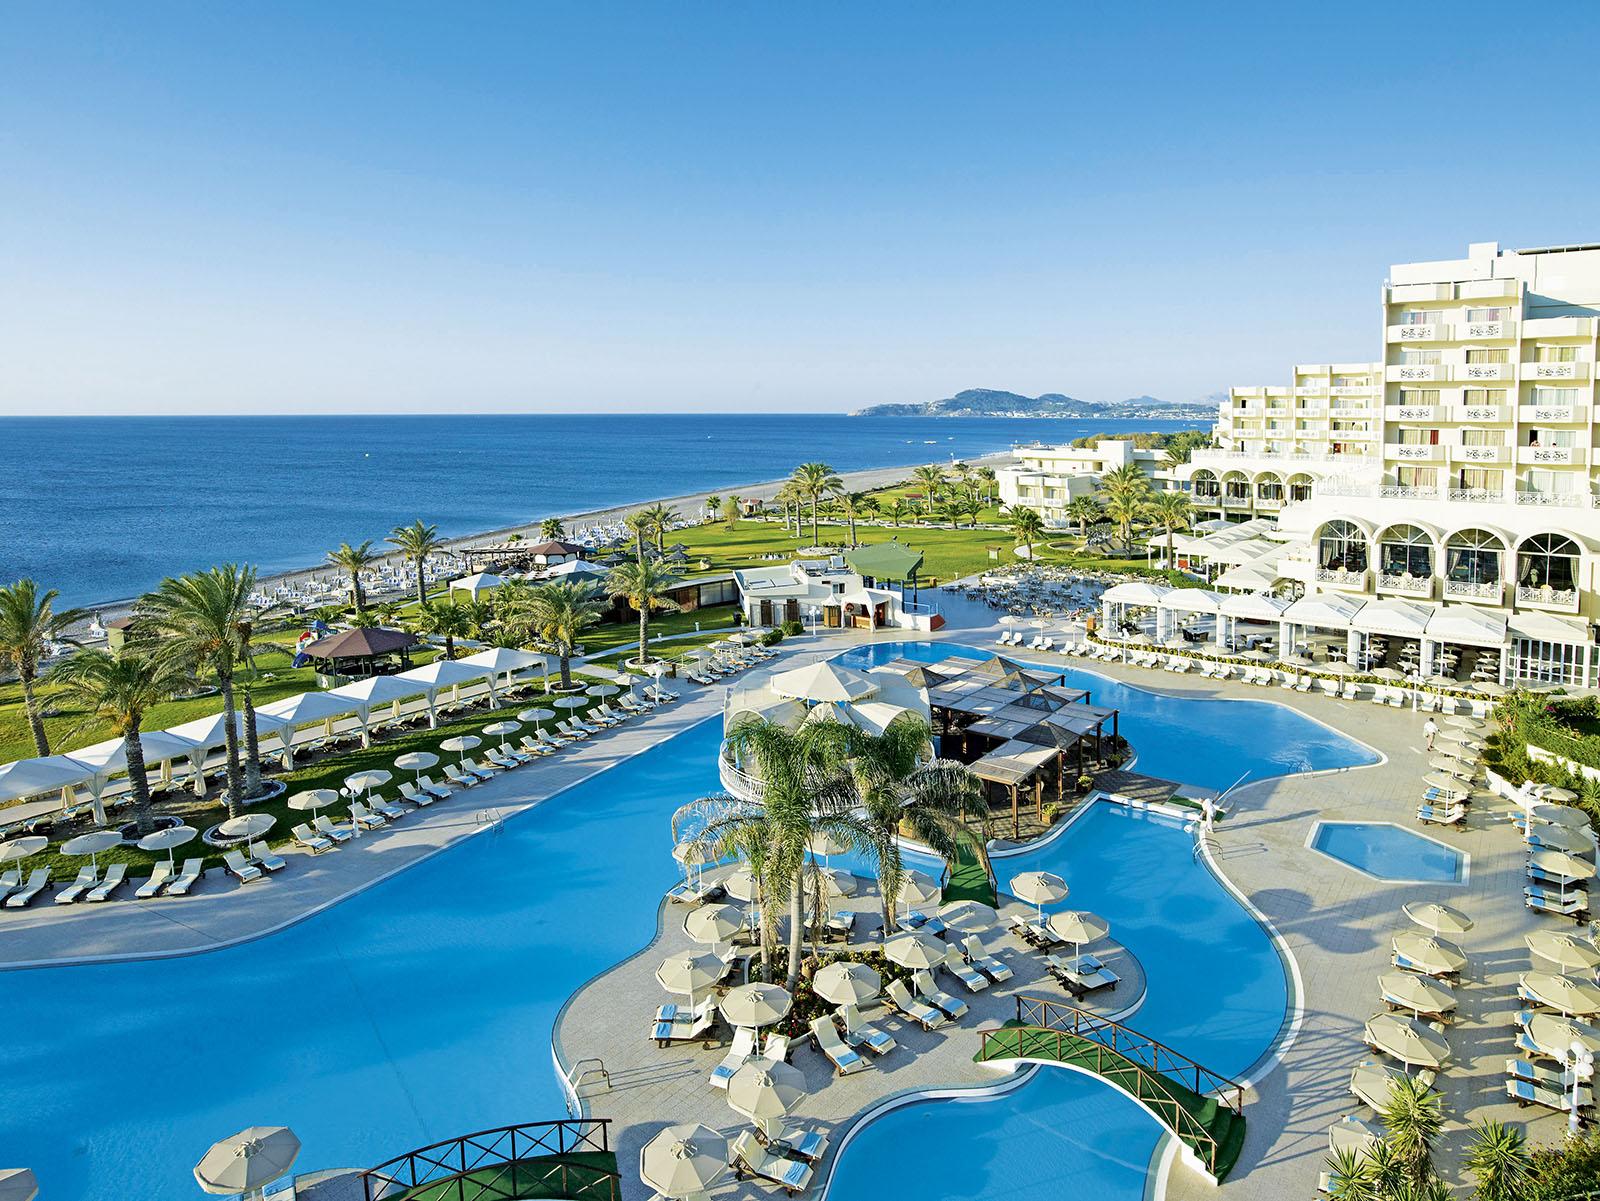 http://www.budavartours.hu/binaries//content/gallery/budavar/locations/accomodations/gorogorszag/kalithea/rodos-palladium-hotel/rhodos_palladium_hotel_kalithea_medence_es_epulet.jpg